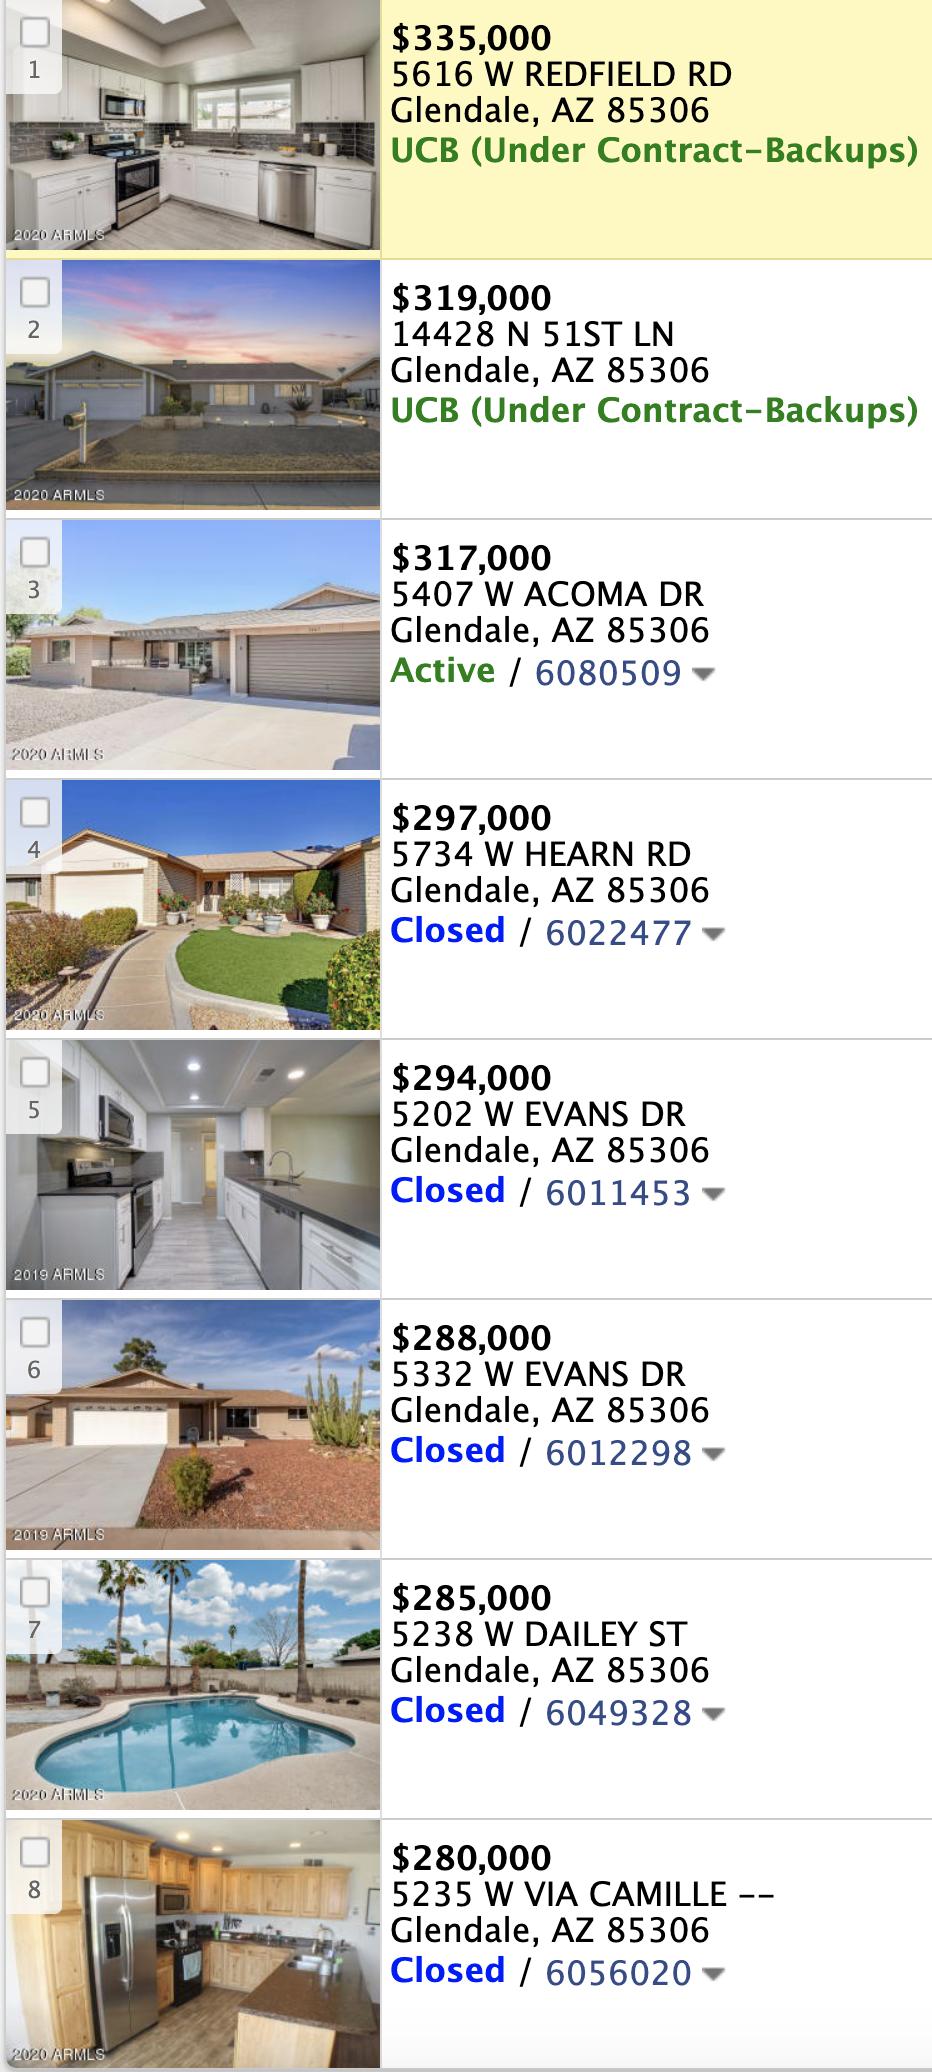 5827 W Hearn Rd Glendale, AZ 85306  comps list